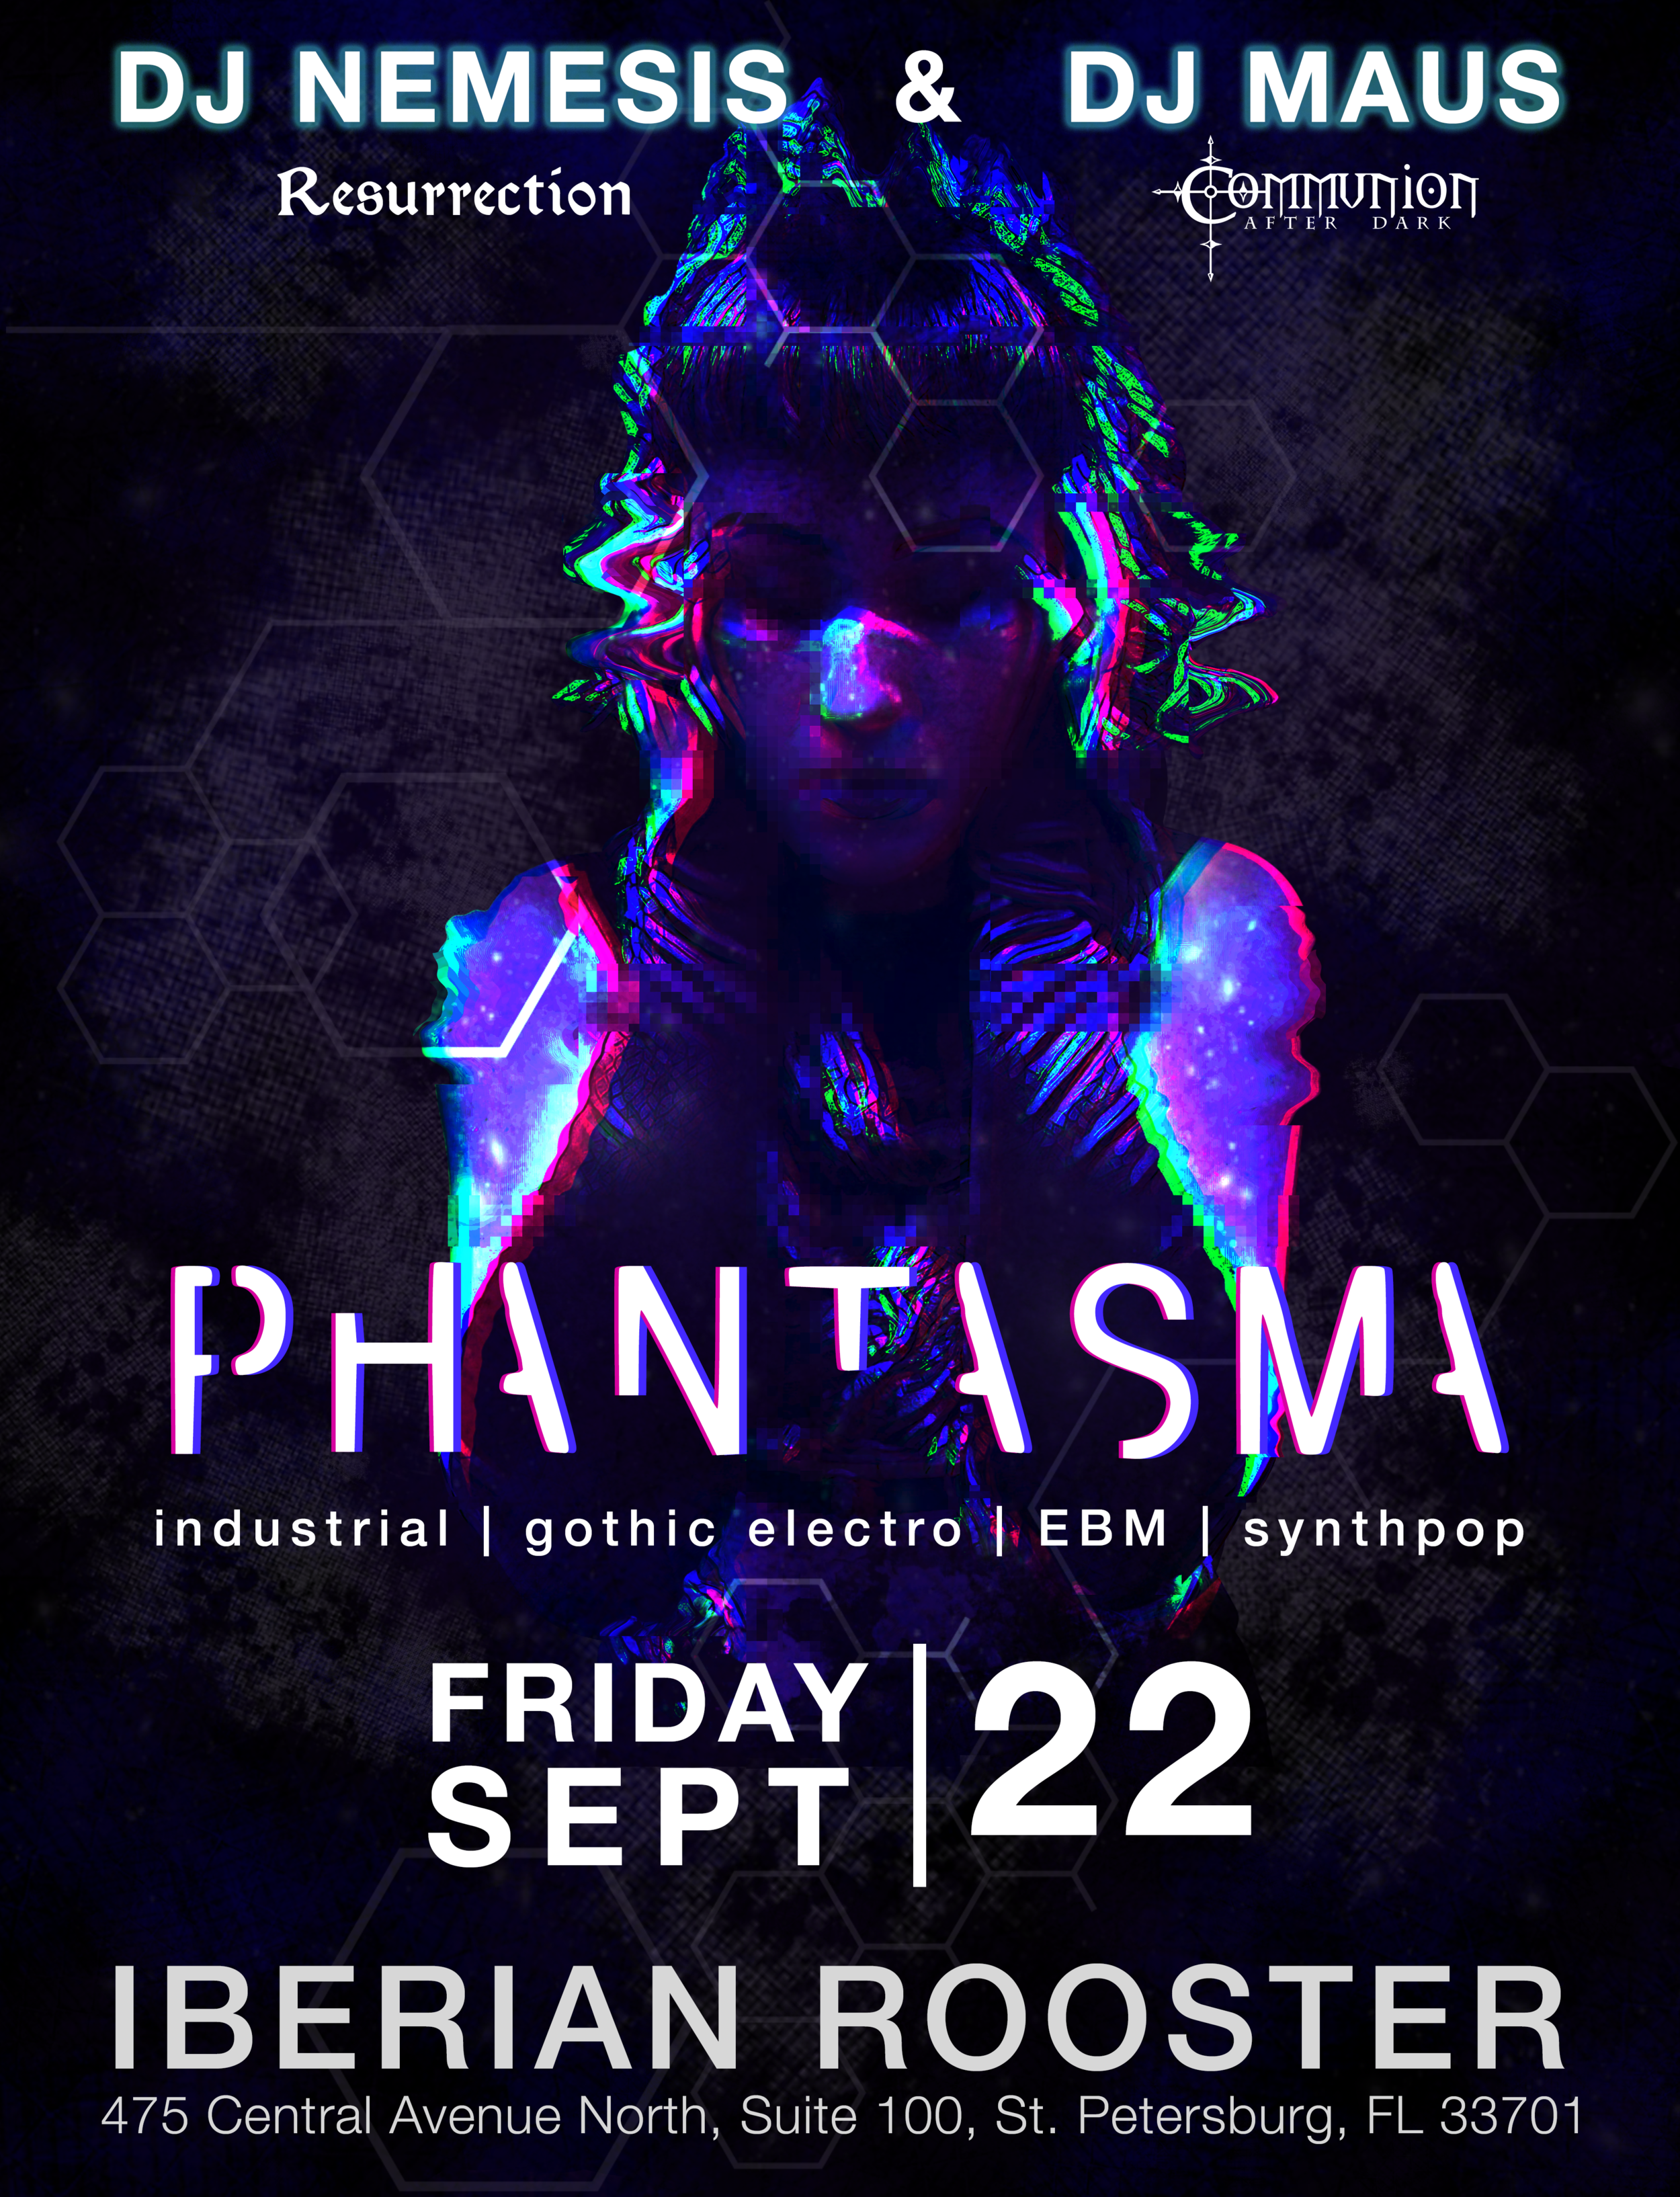 Phatasma-flyer.png